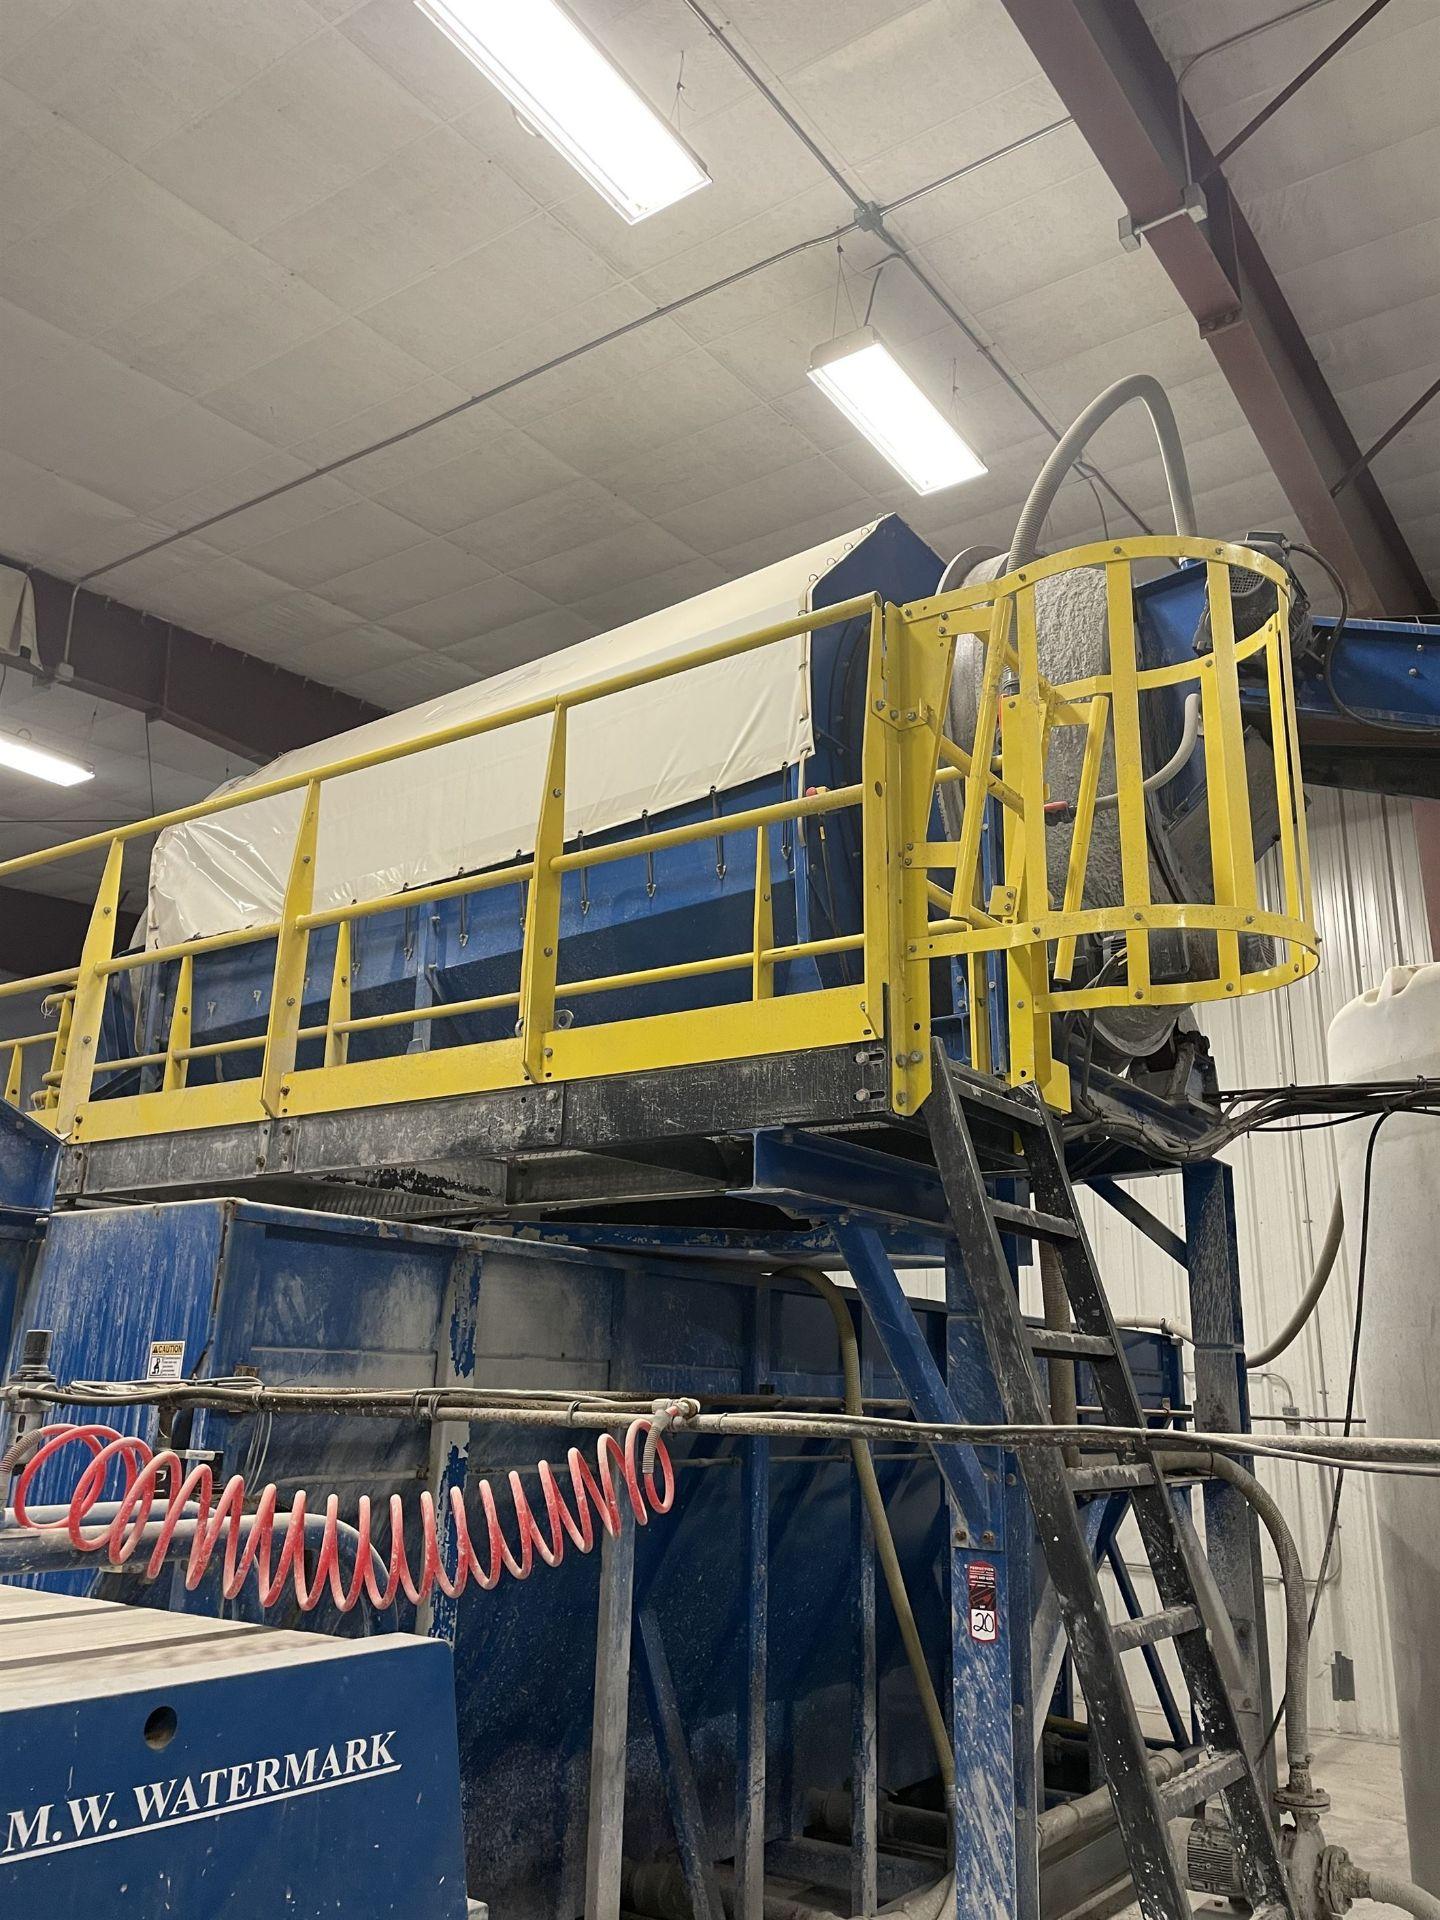 2015 LUBO SYSTEMS WASHING DRUM 1800x5000 Rotary Washing Drum, s/n 800108-0160, 1.8 m Drum